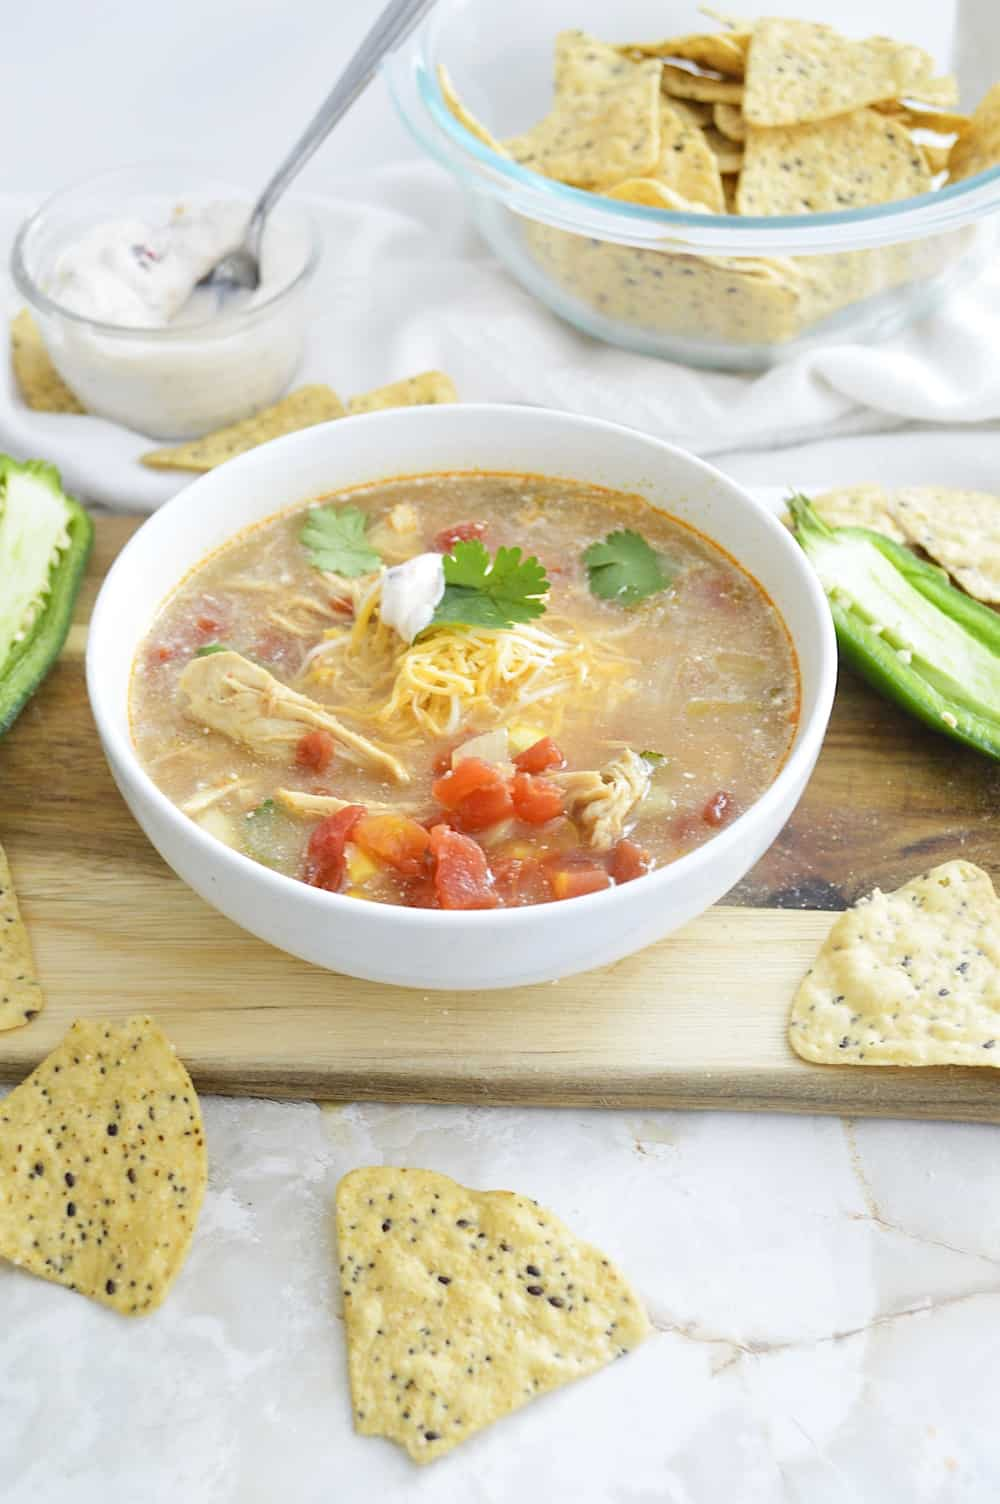 White bowl of crock pot chicken tortilla stew on a wooden board.